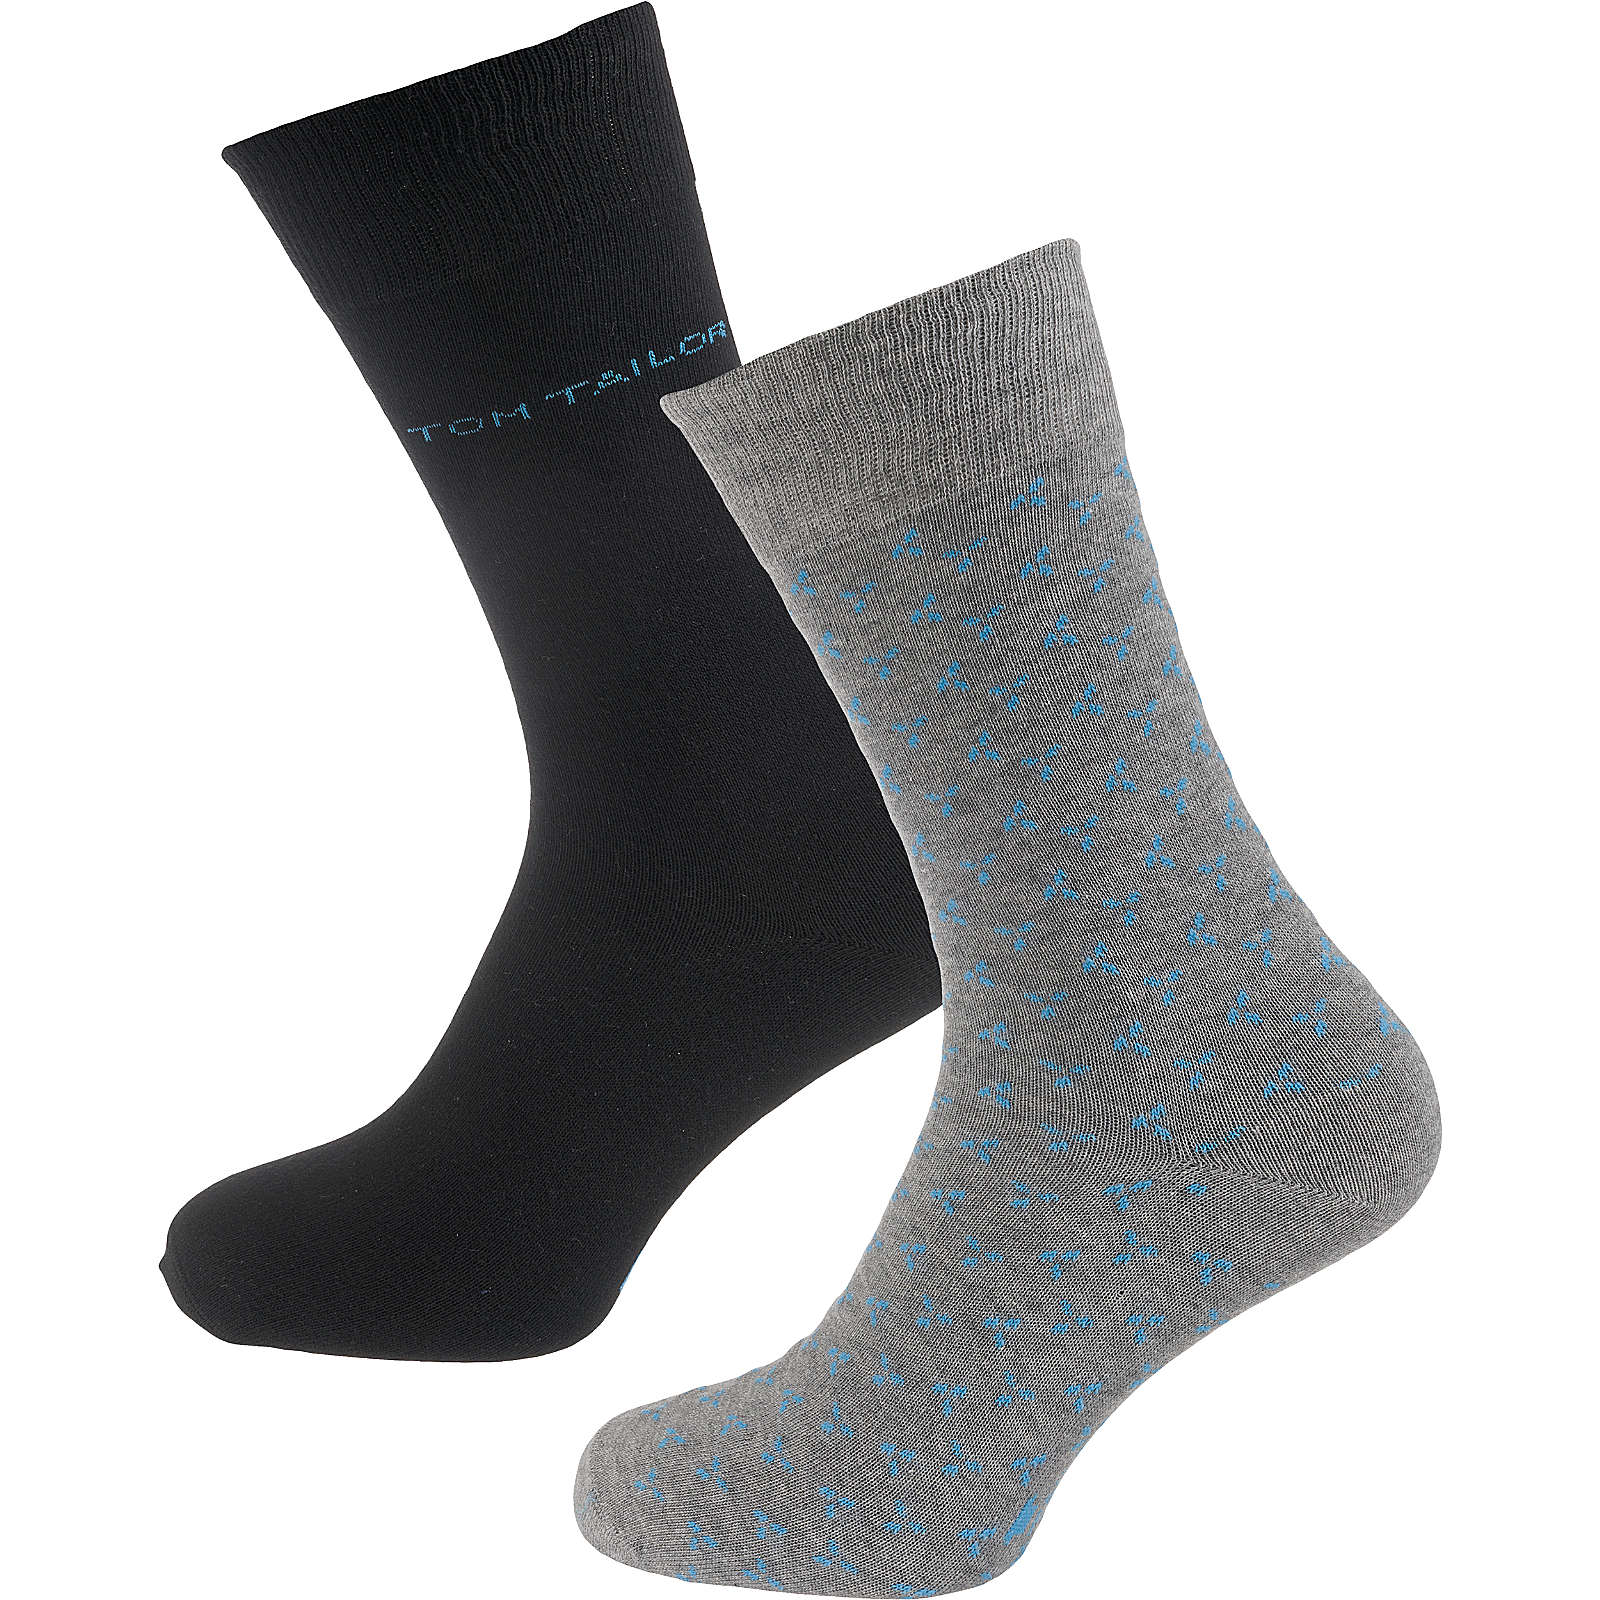 TOM TAILOR 2 Paar Socken grau Herren Gr. 43-46